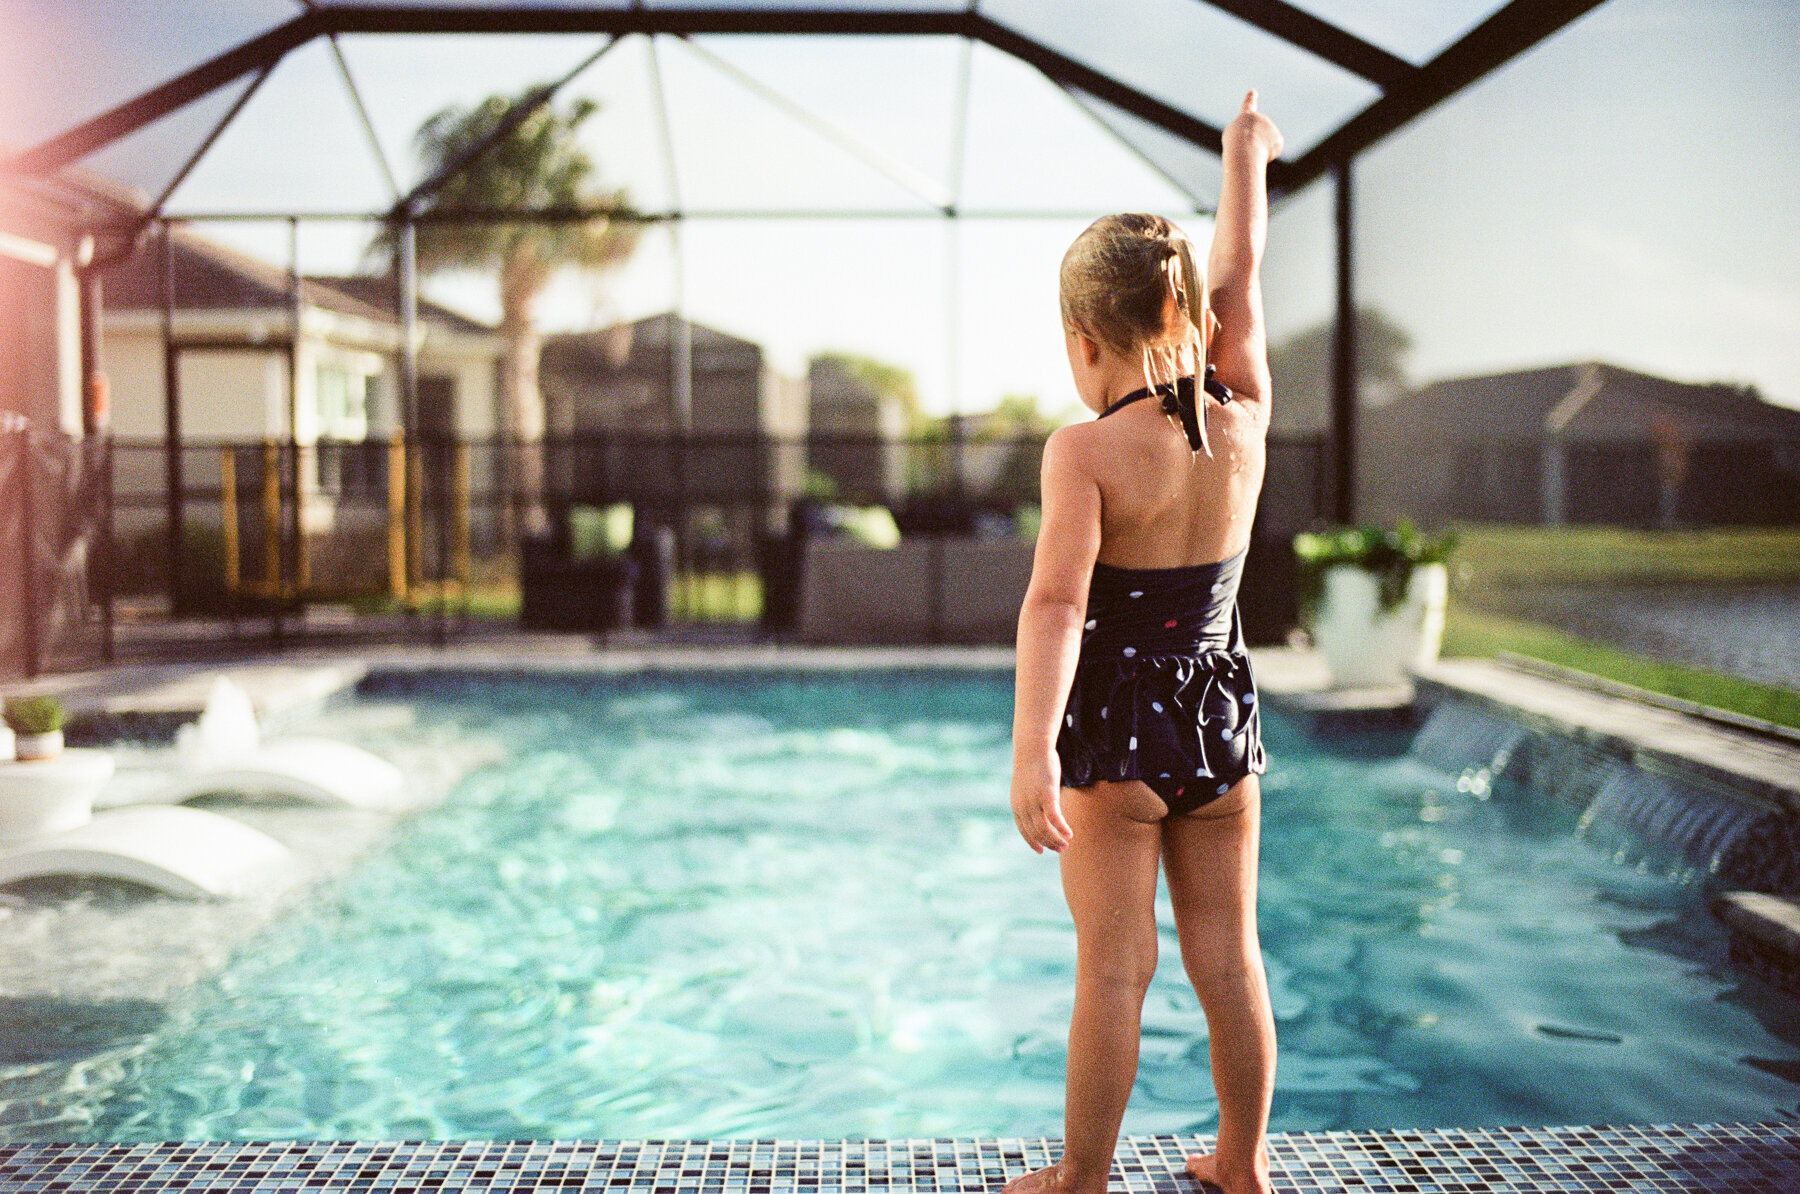 Leica-M6-Pool-Chloe-10-2.jpg